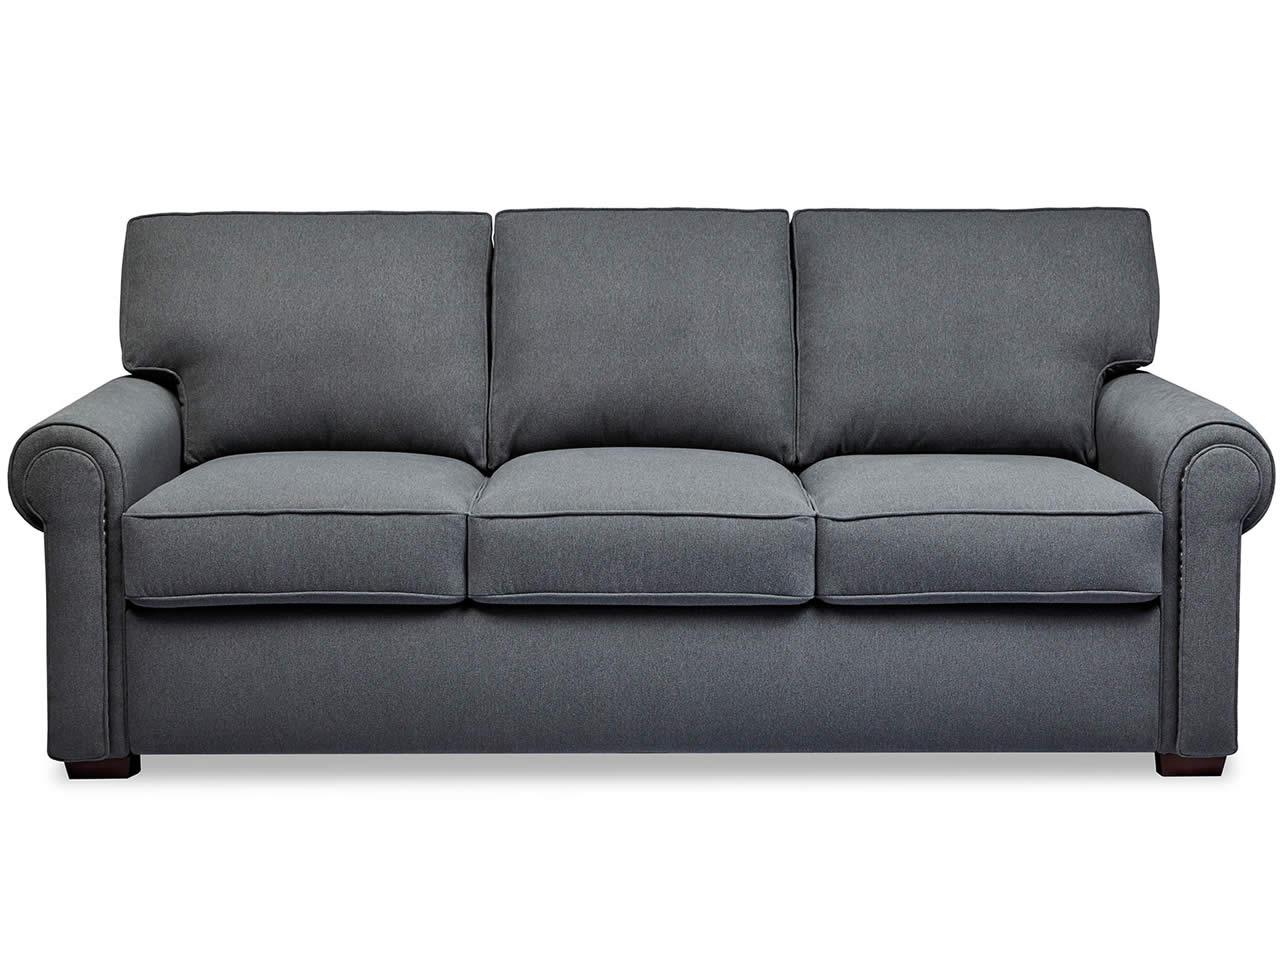 Reese Sleeper Sofa Sofas Amp Chairs Of Minnesota